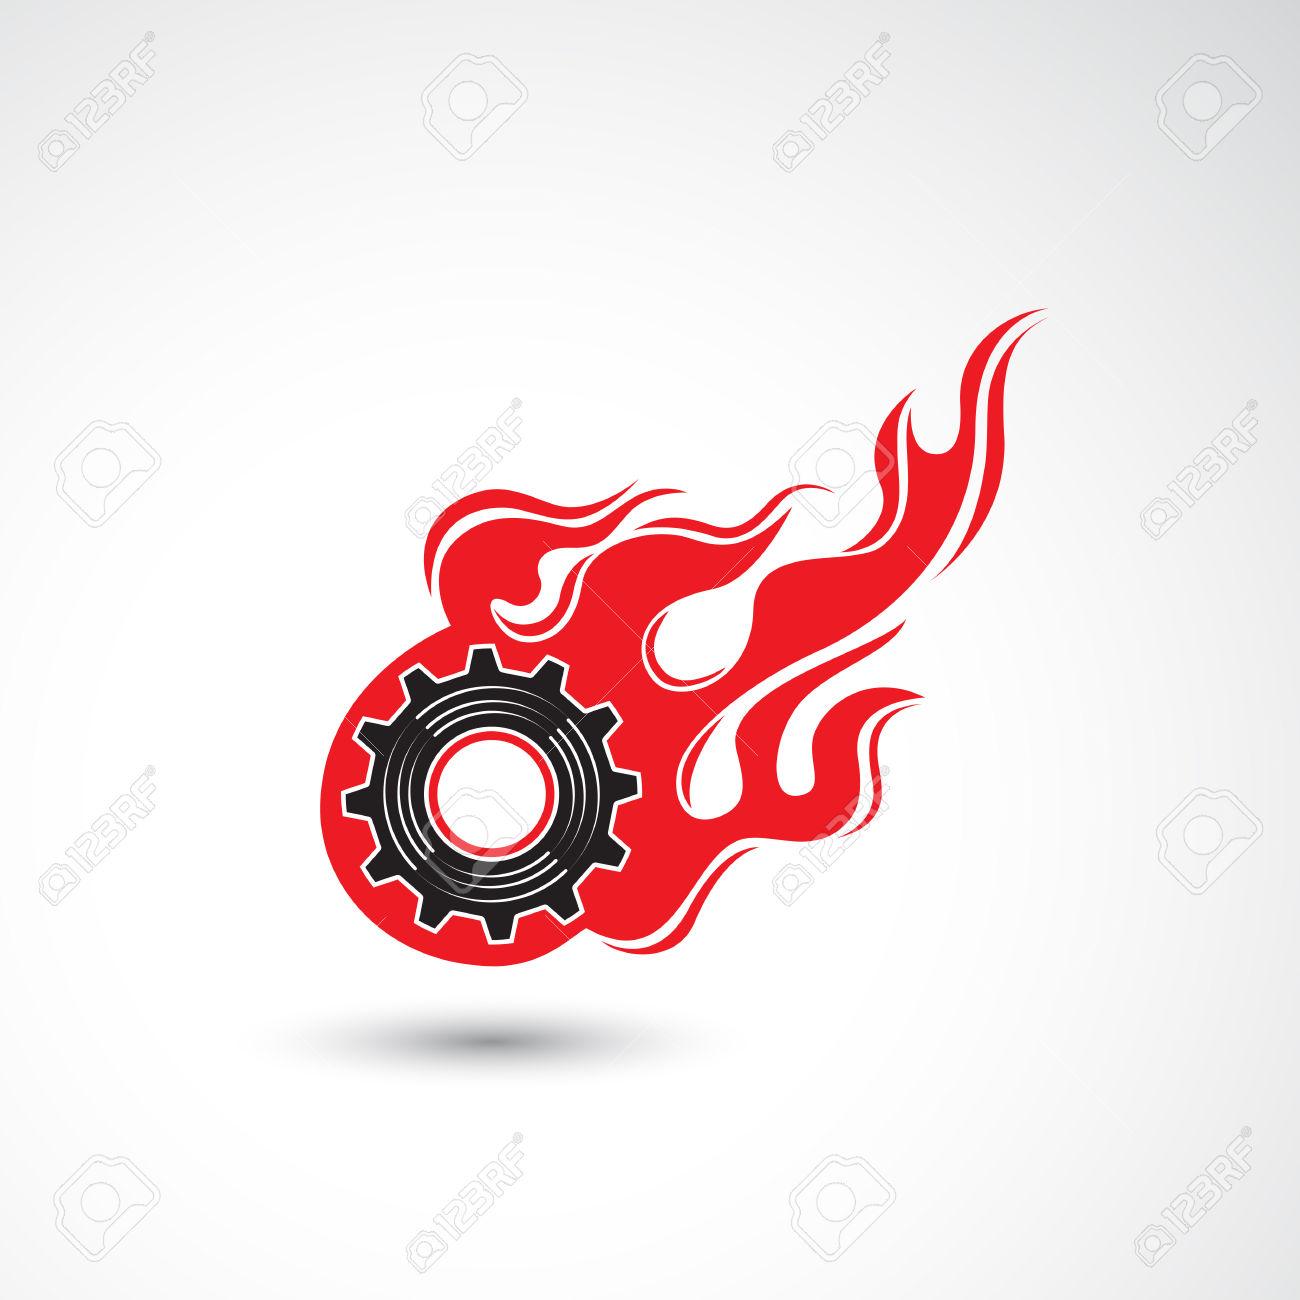 Wheel In Fire Flame Icon Abstract Logo Design Vector Template.